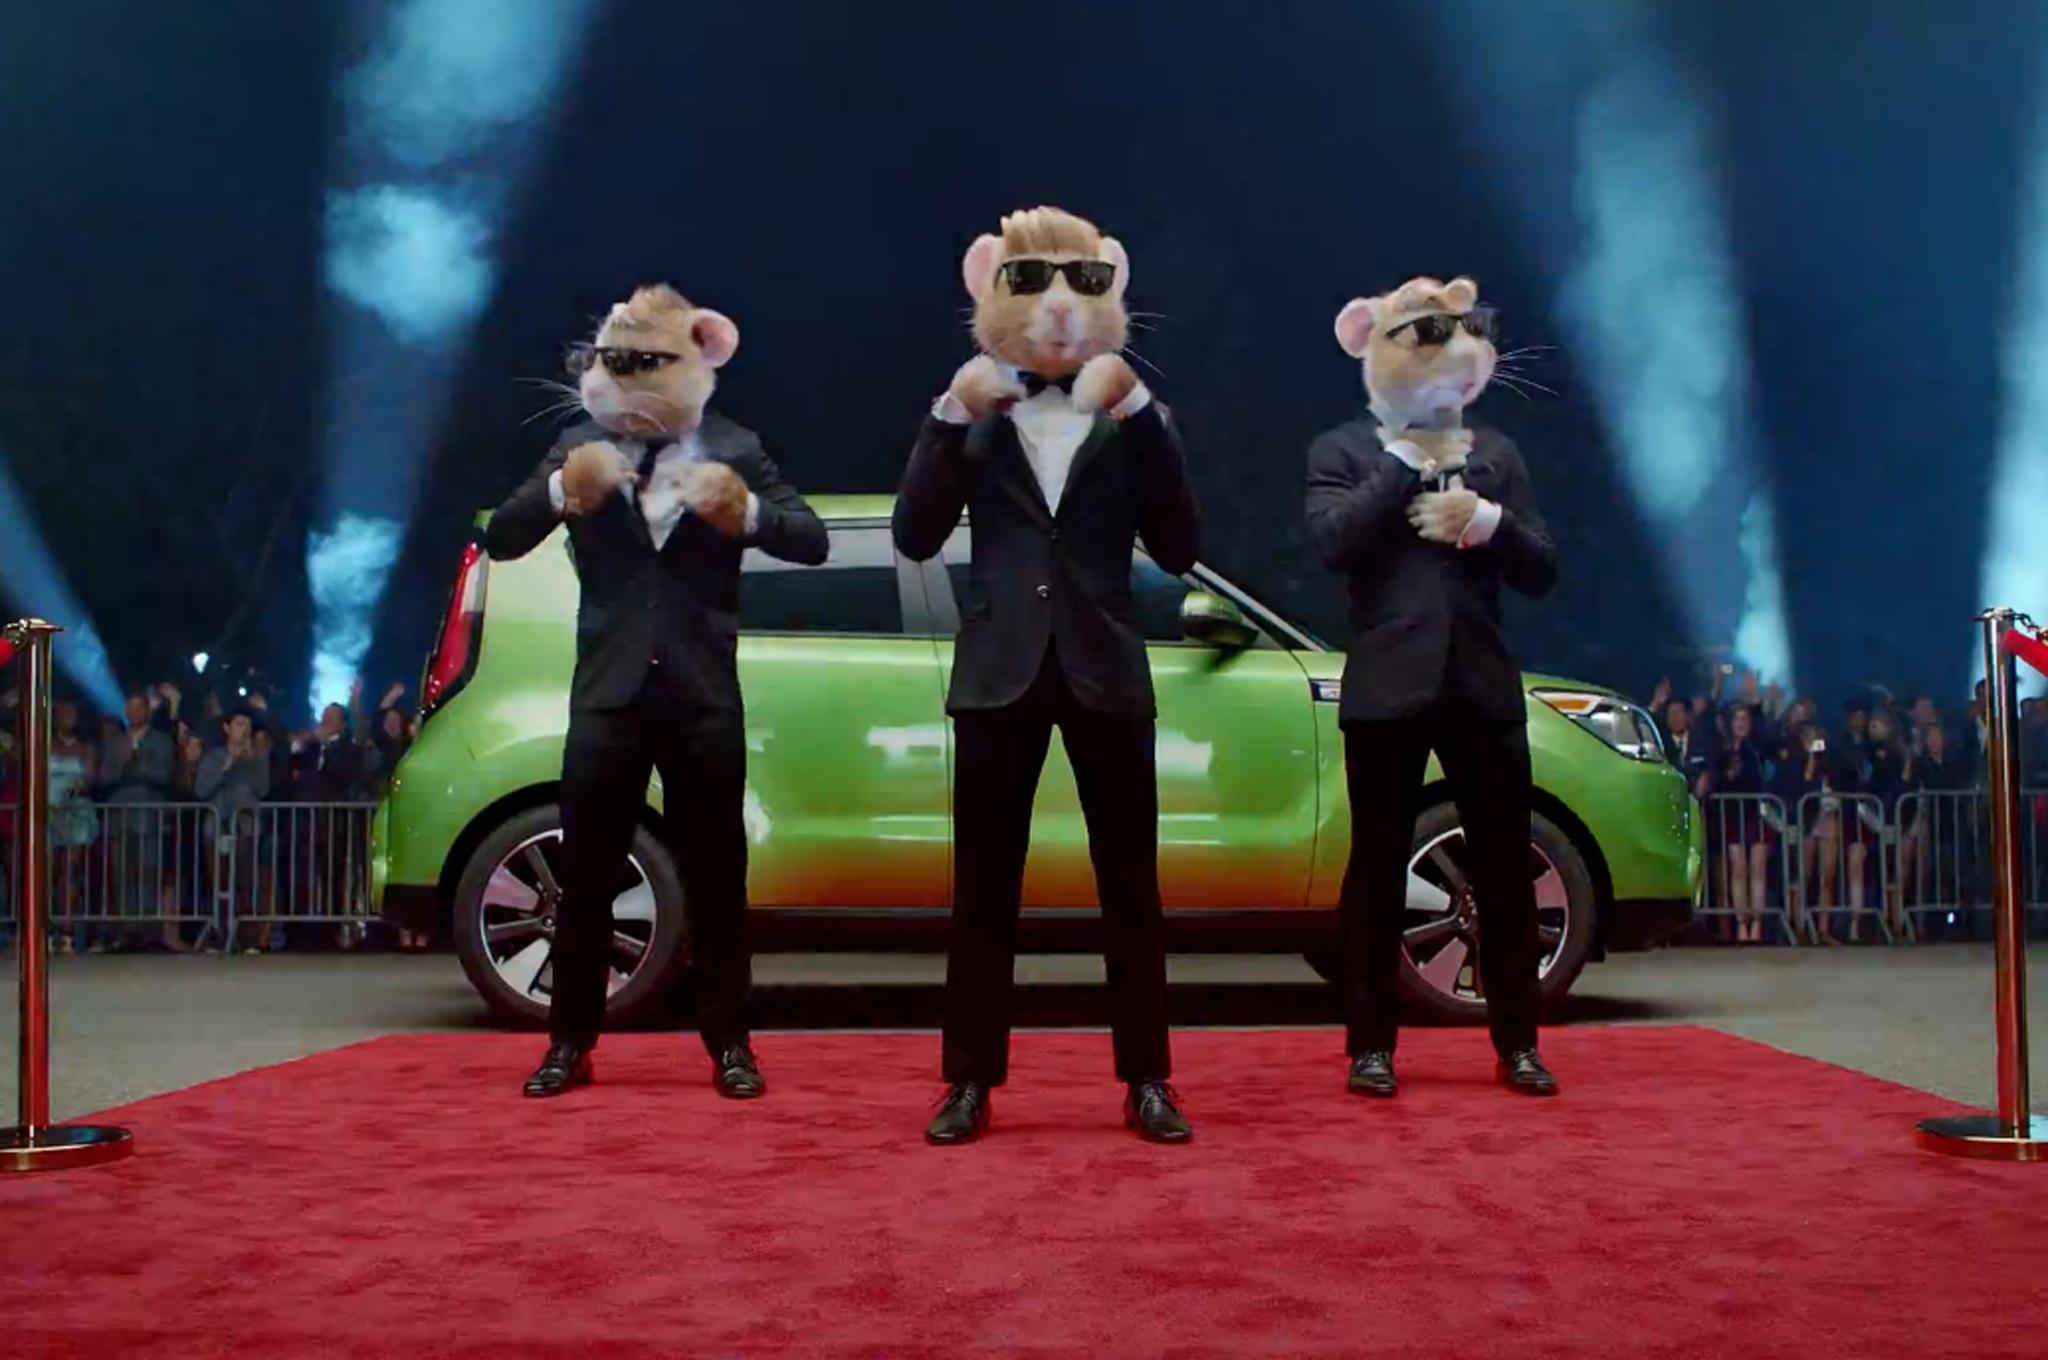 2014 Kia Soul For Sale >> 2014 Kia Soul Ad Shows off Stylish New Hamsters